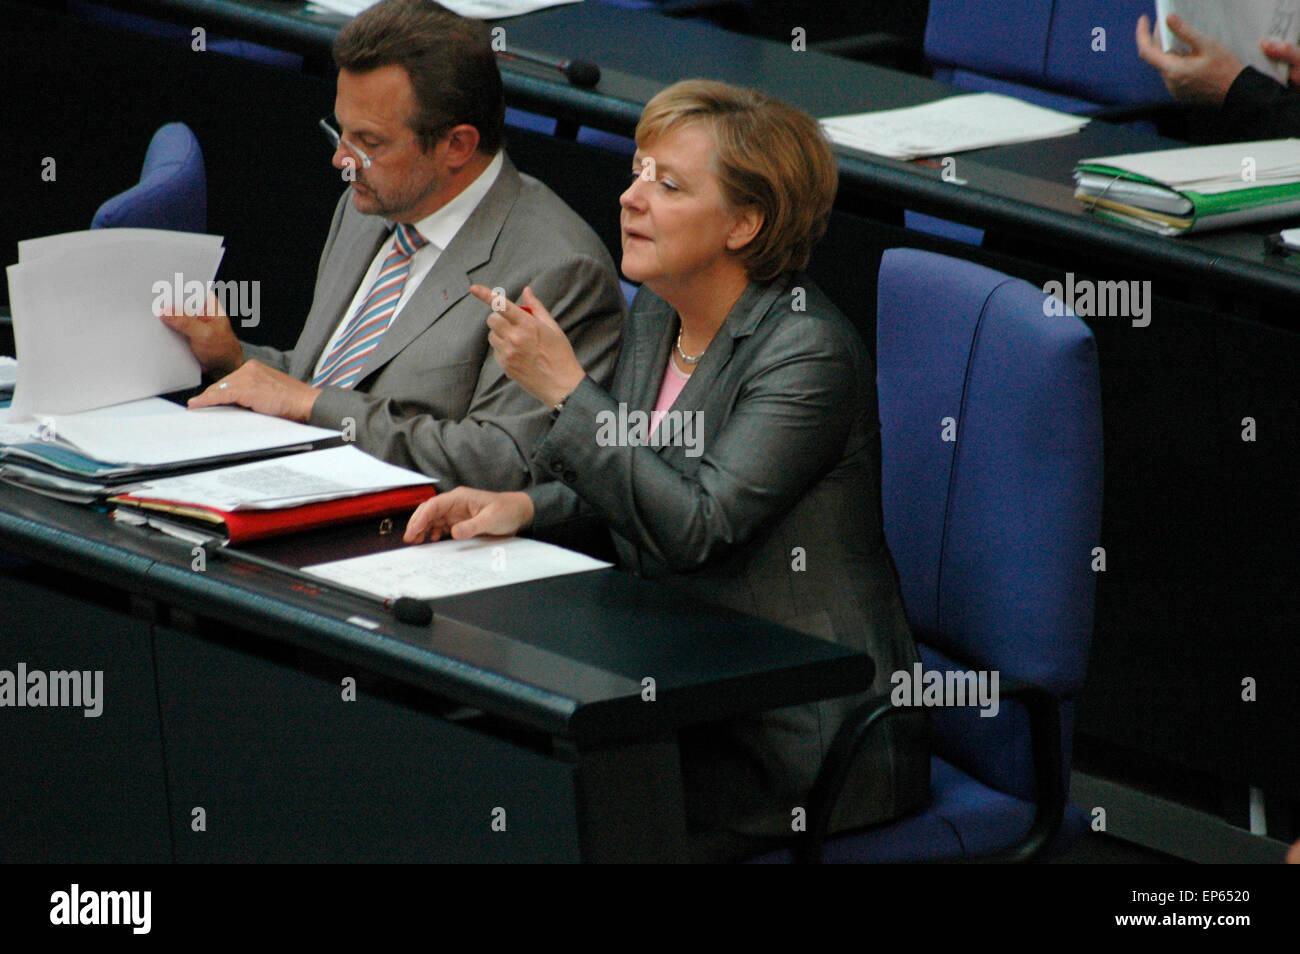 Bundeskanzlerin Angela Merkel   - Sitzung im Bundestag am 29. Juni 2006, Reichstagsgebaeude, Berlin-Tiergarten. Stock Photo